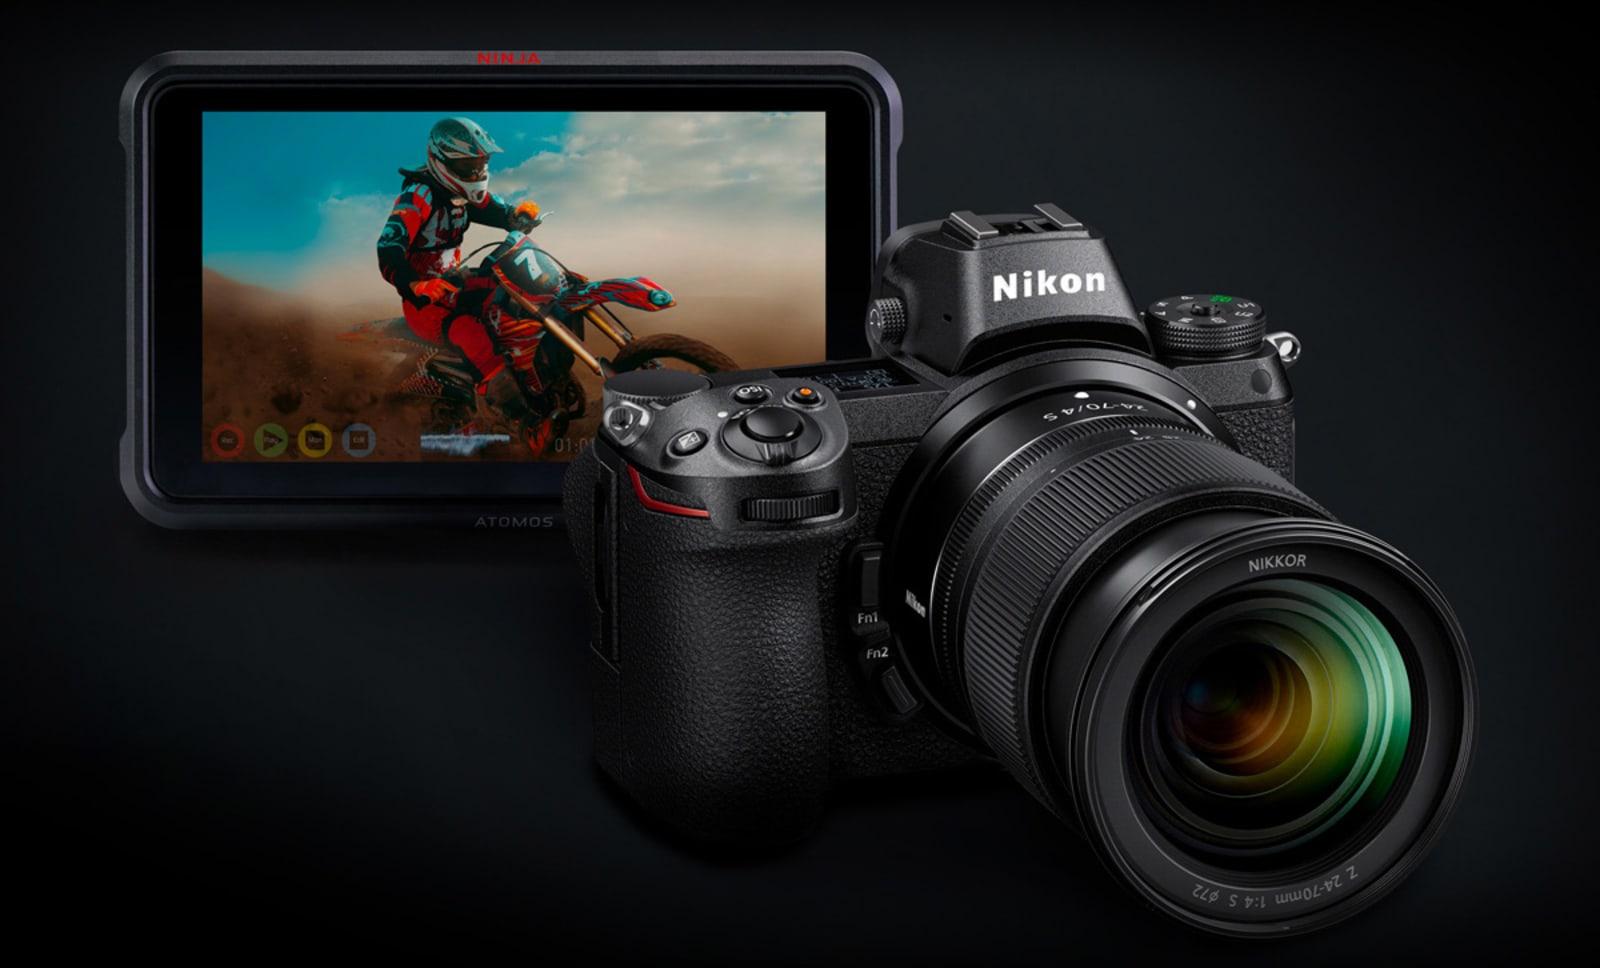 Nikon Atomos ProRes RAW video